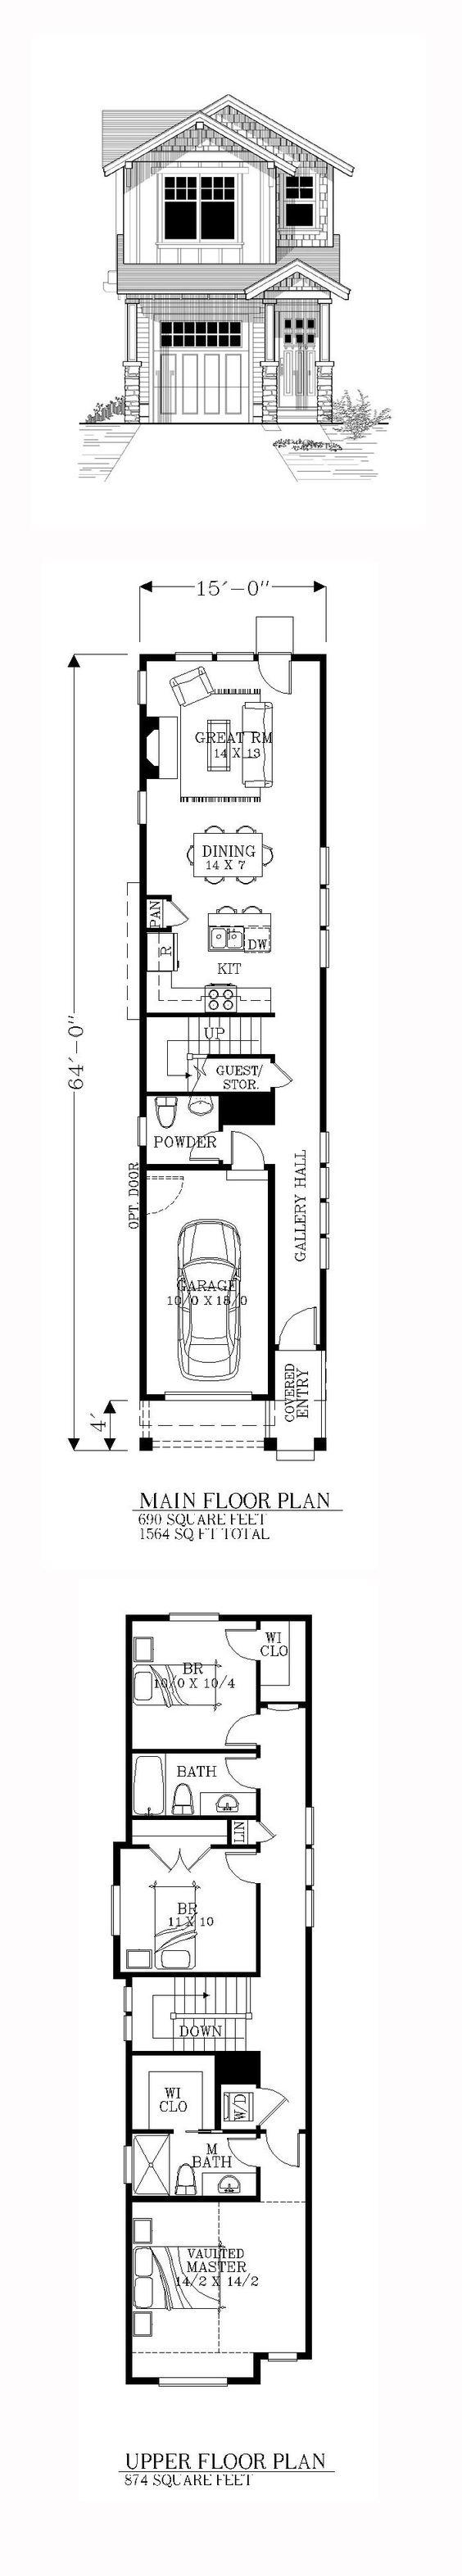 Bathroom Floor Plans Long Narrow narrow lot house plan 46245 | total living area: 1564 sq. ft., 3